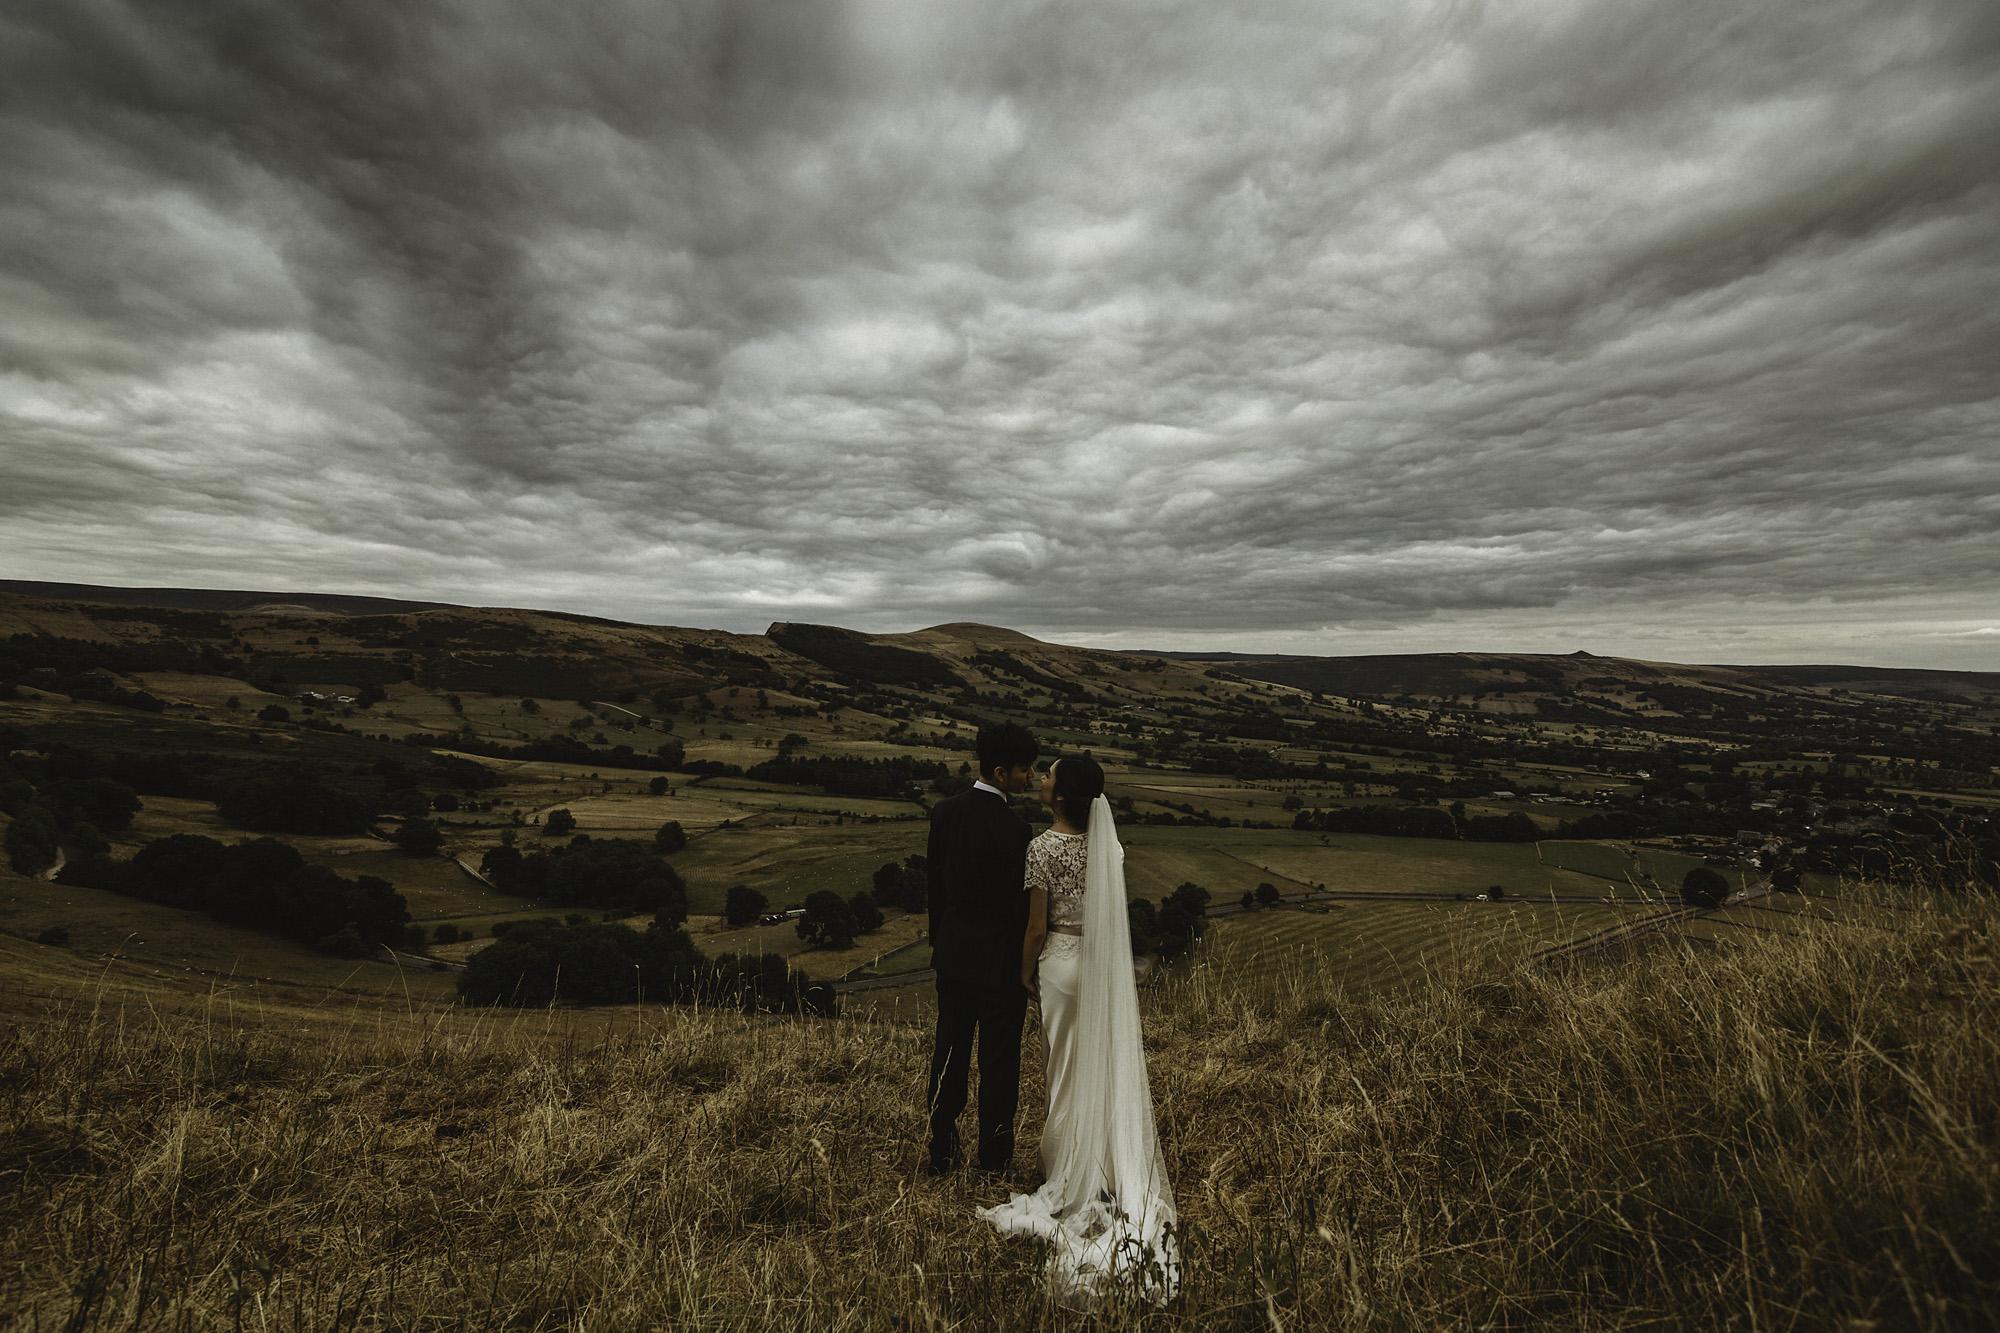 Kate-Beaumont-Wedding-Dress-Bridal-Separates-Peak-District-Shoot-5.jpg